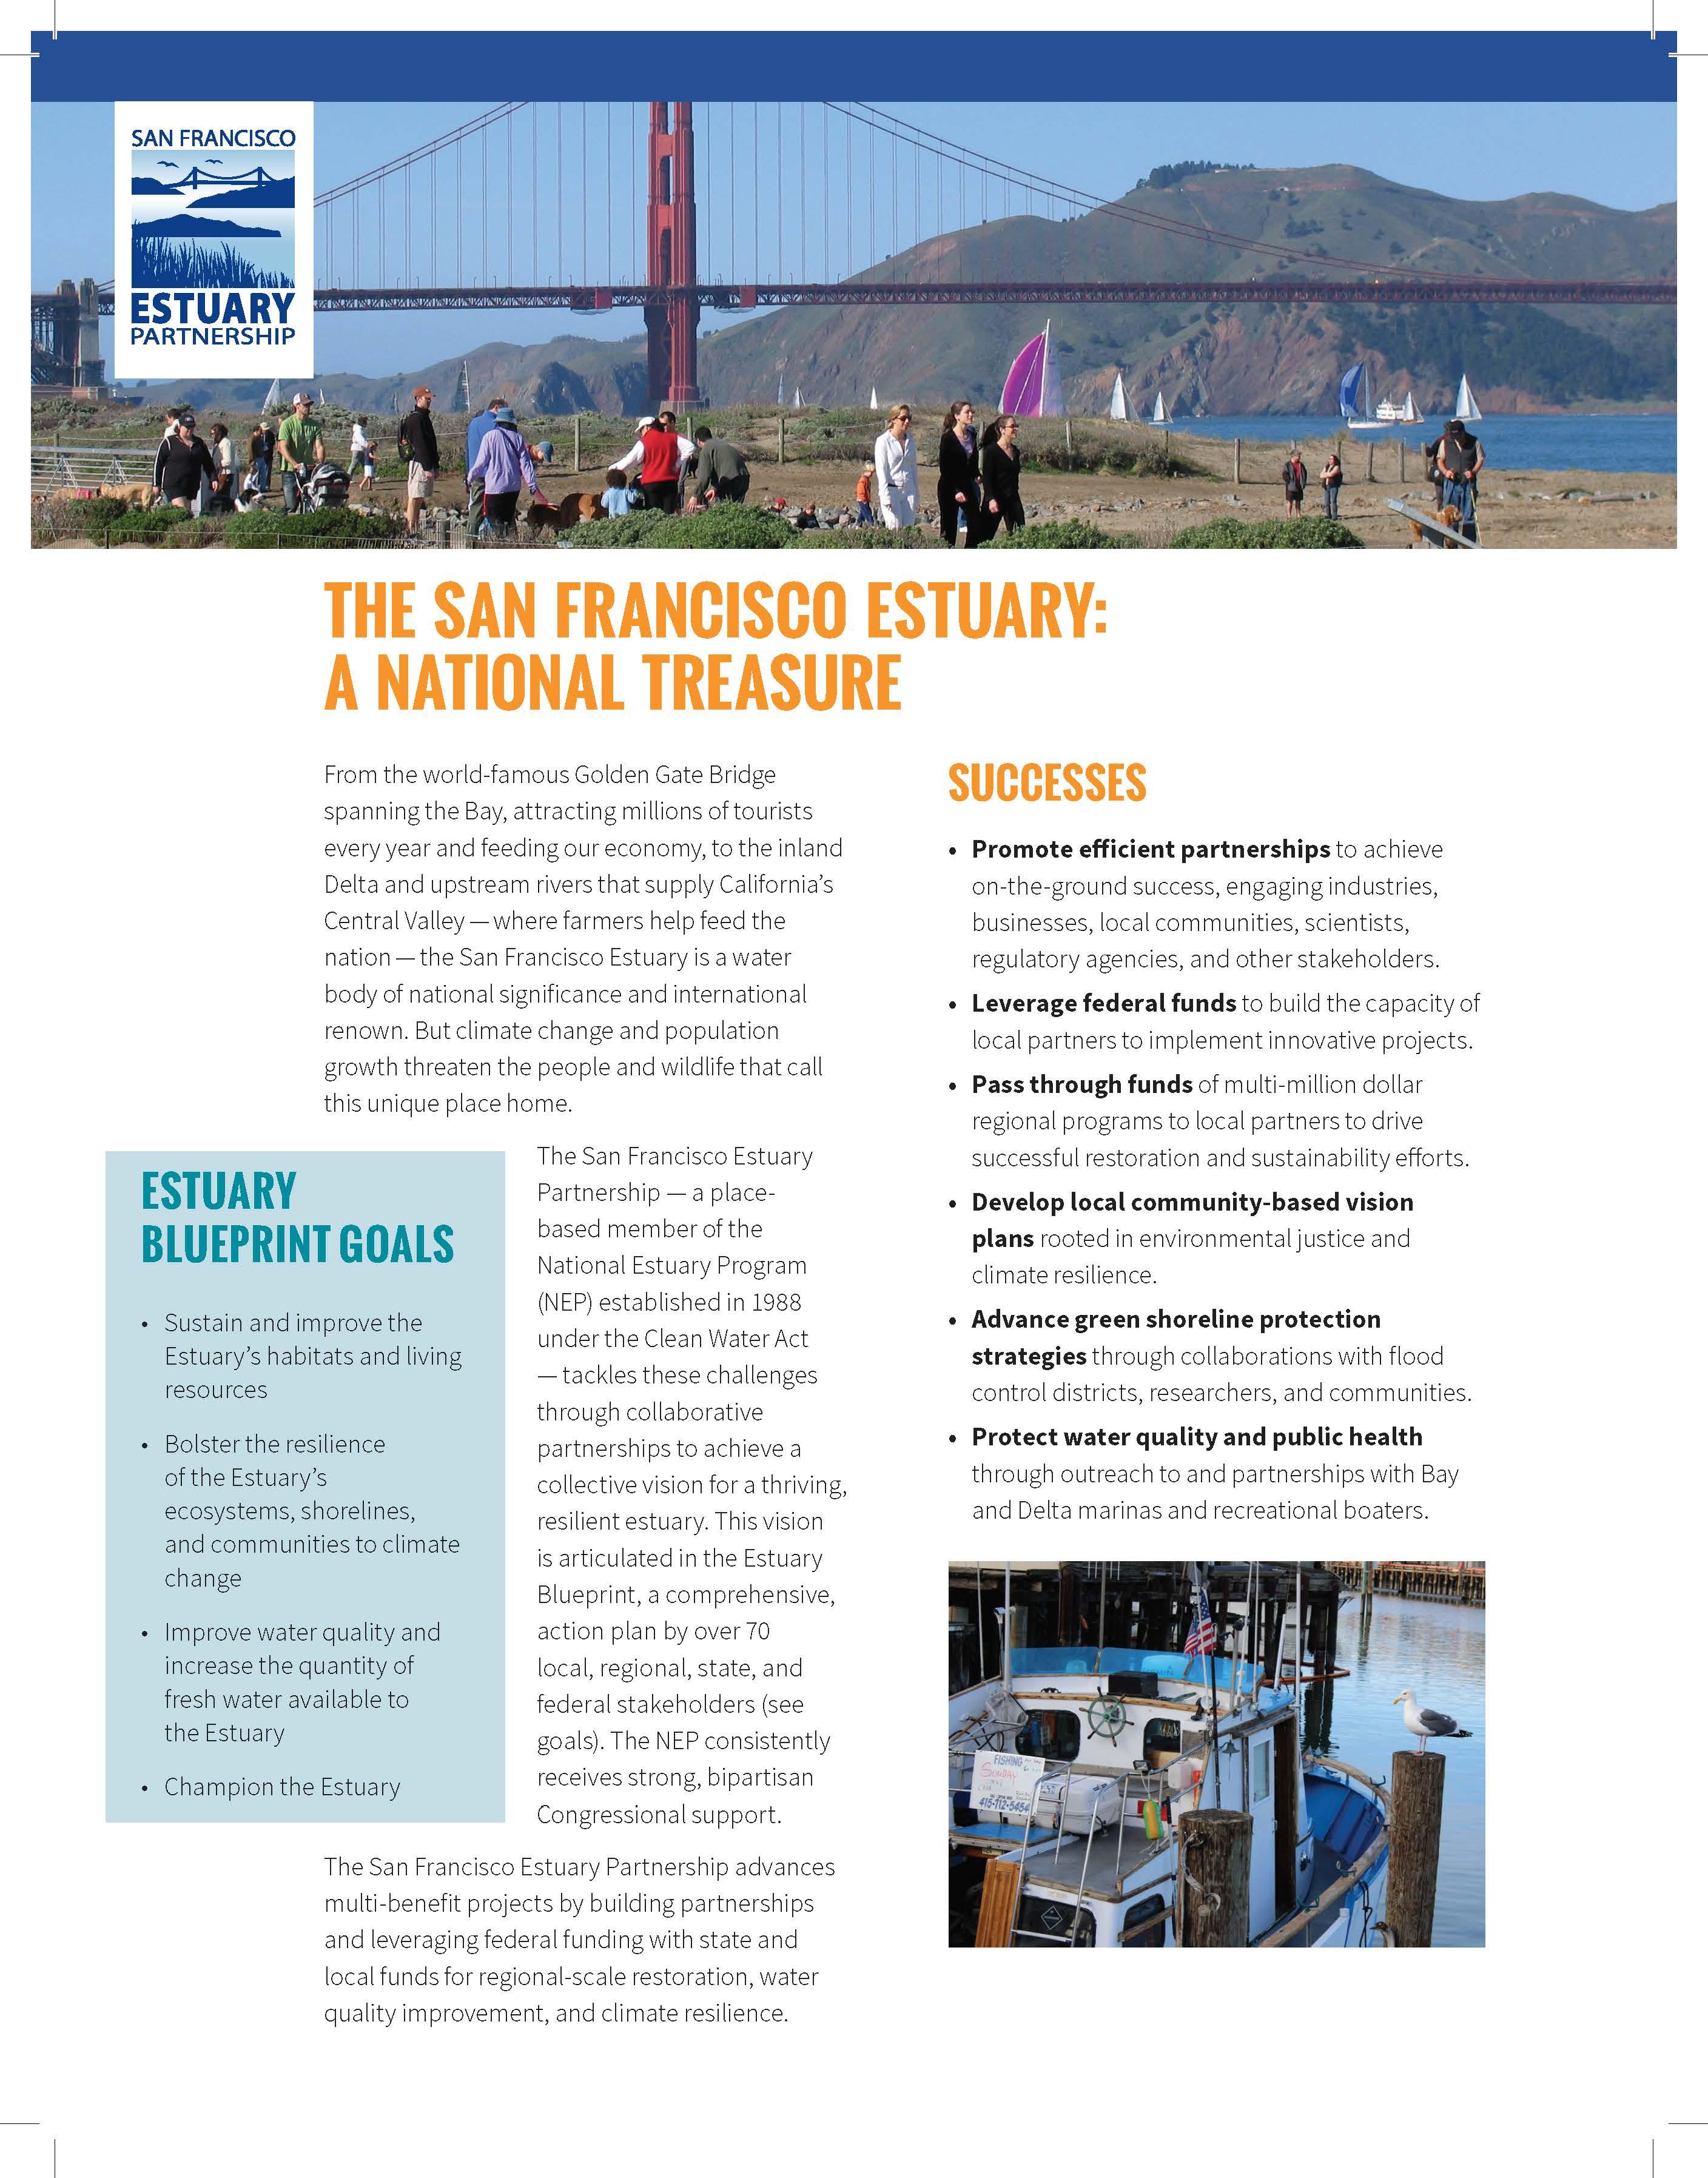 Image of 2019 SFEP factsheet